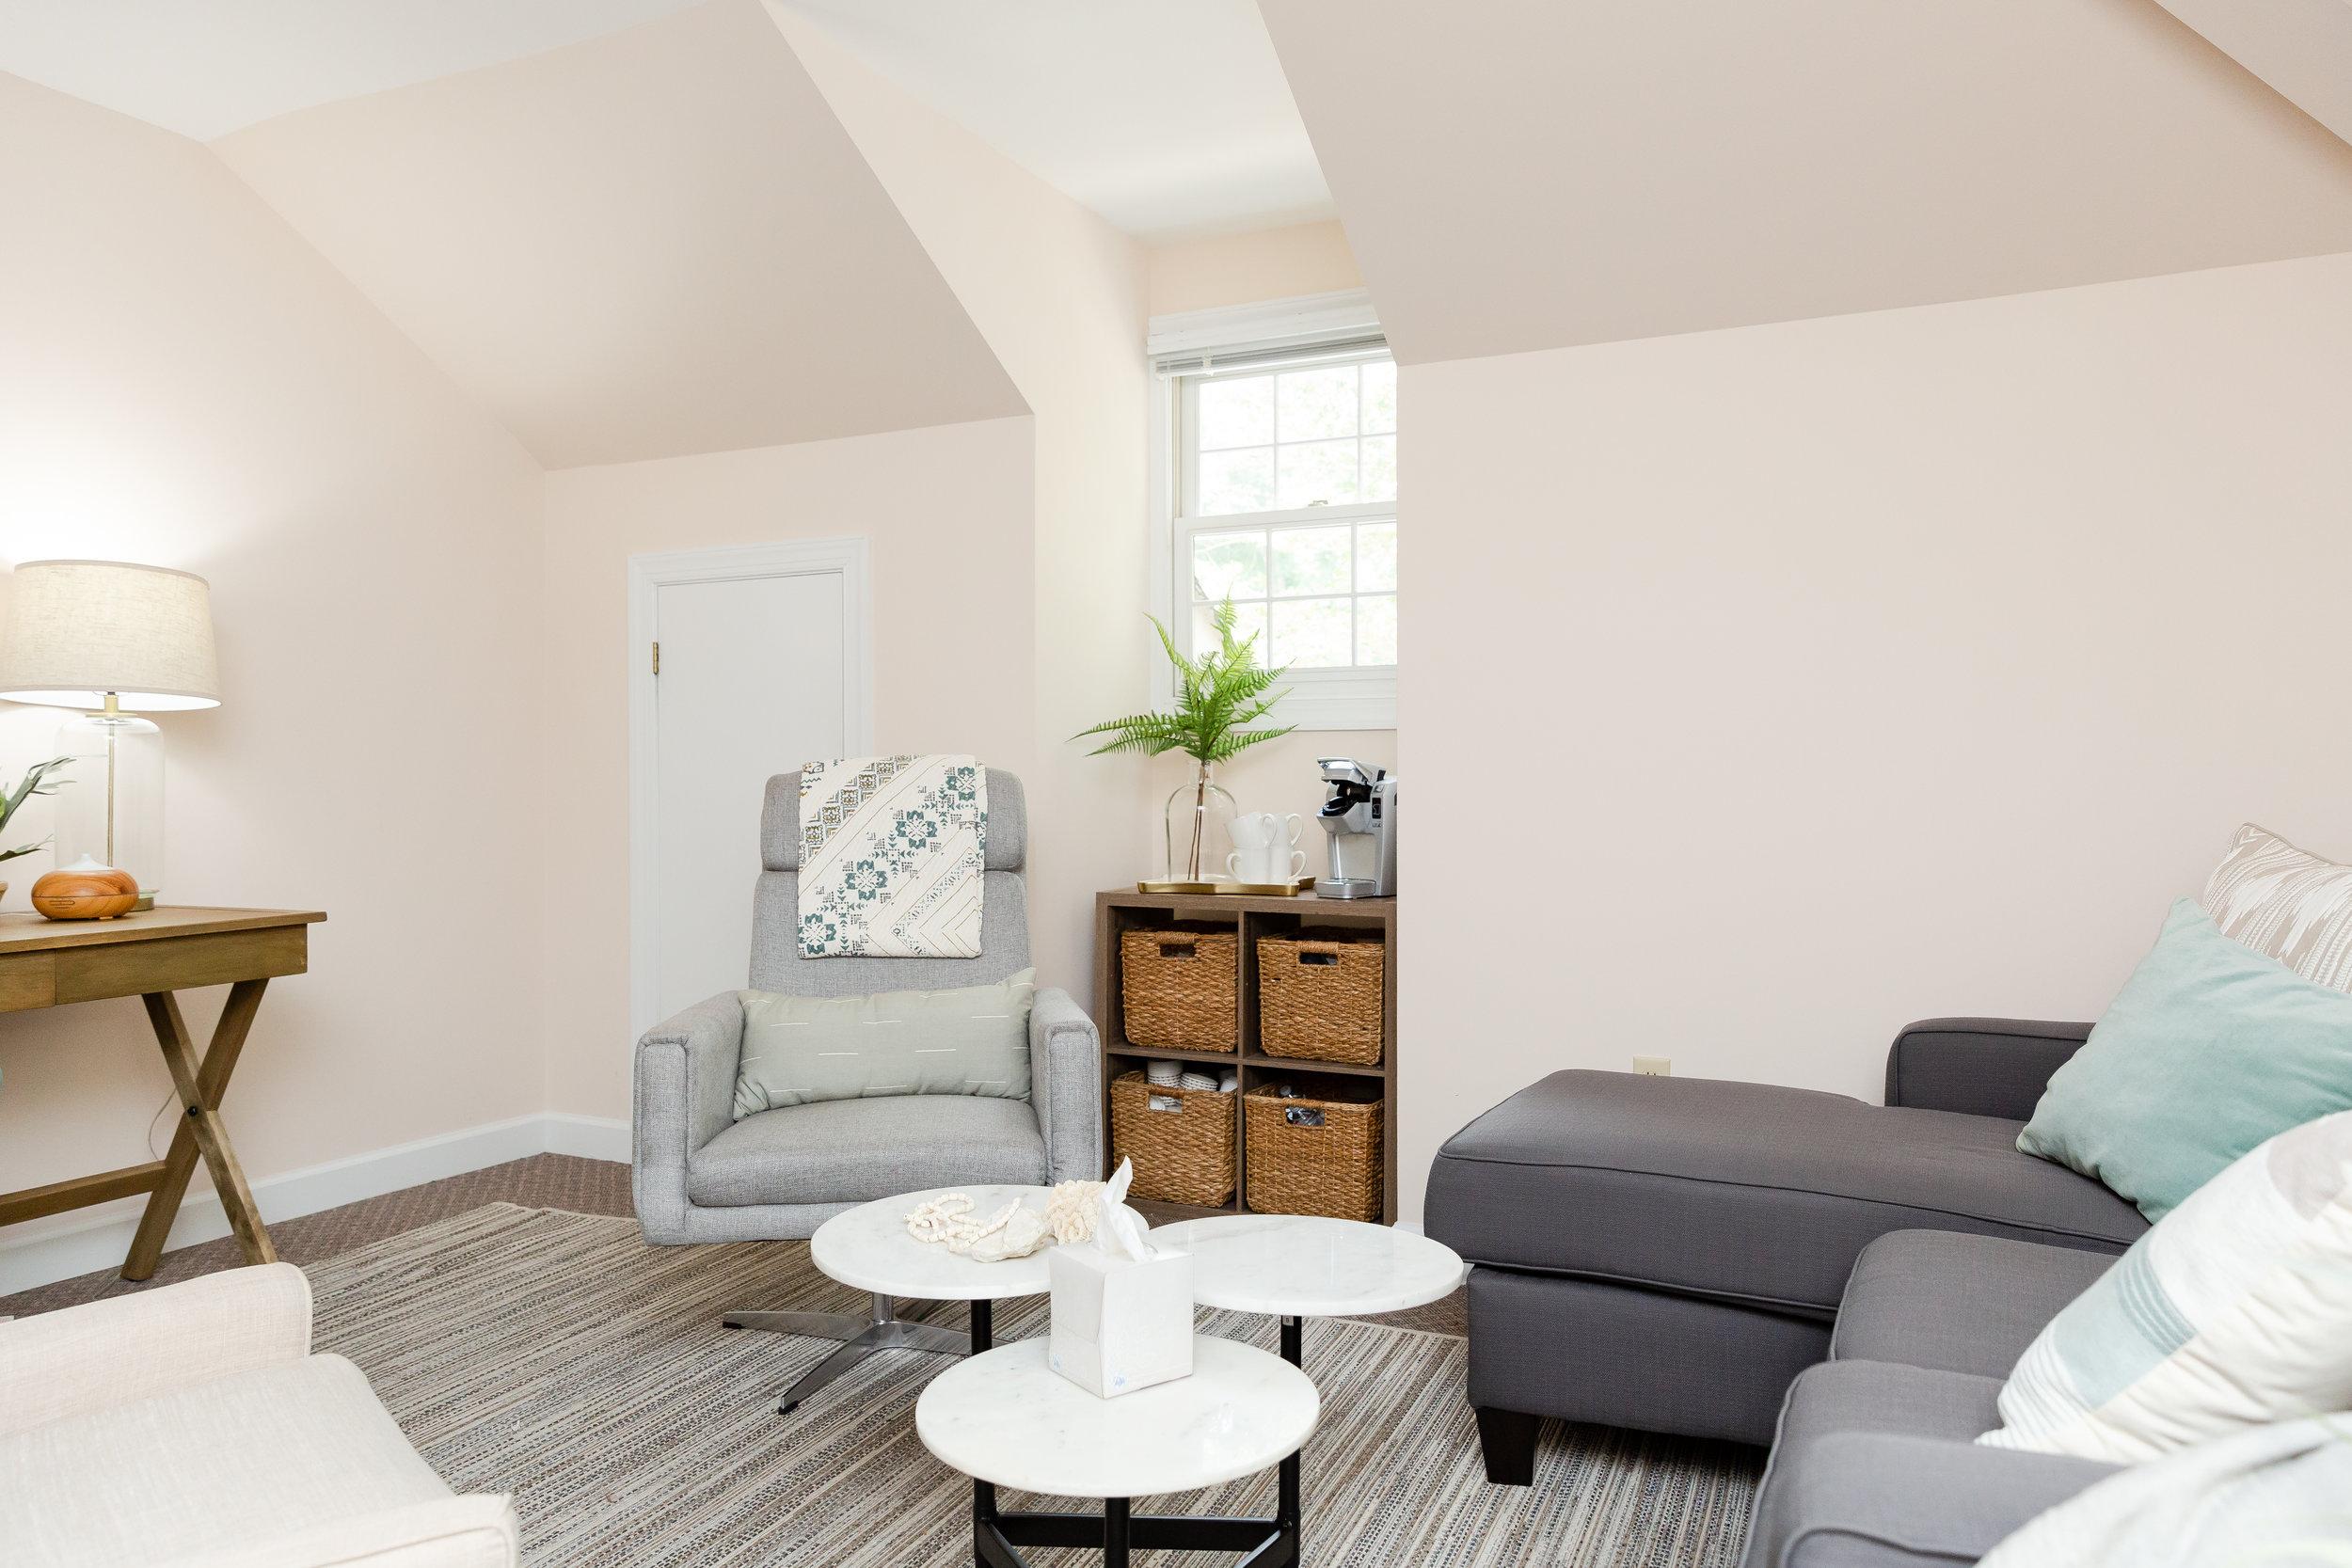 Making Room for Peace - Abundant Life Partners Office